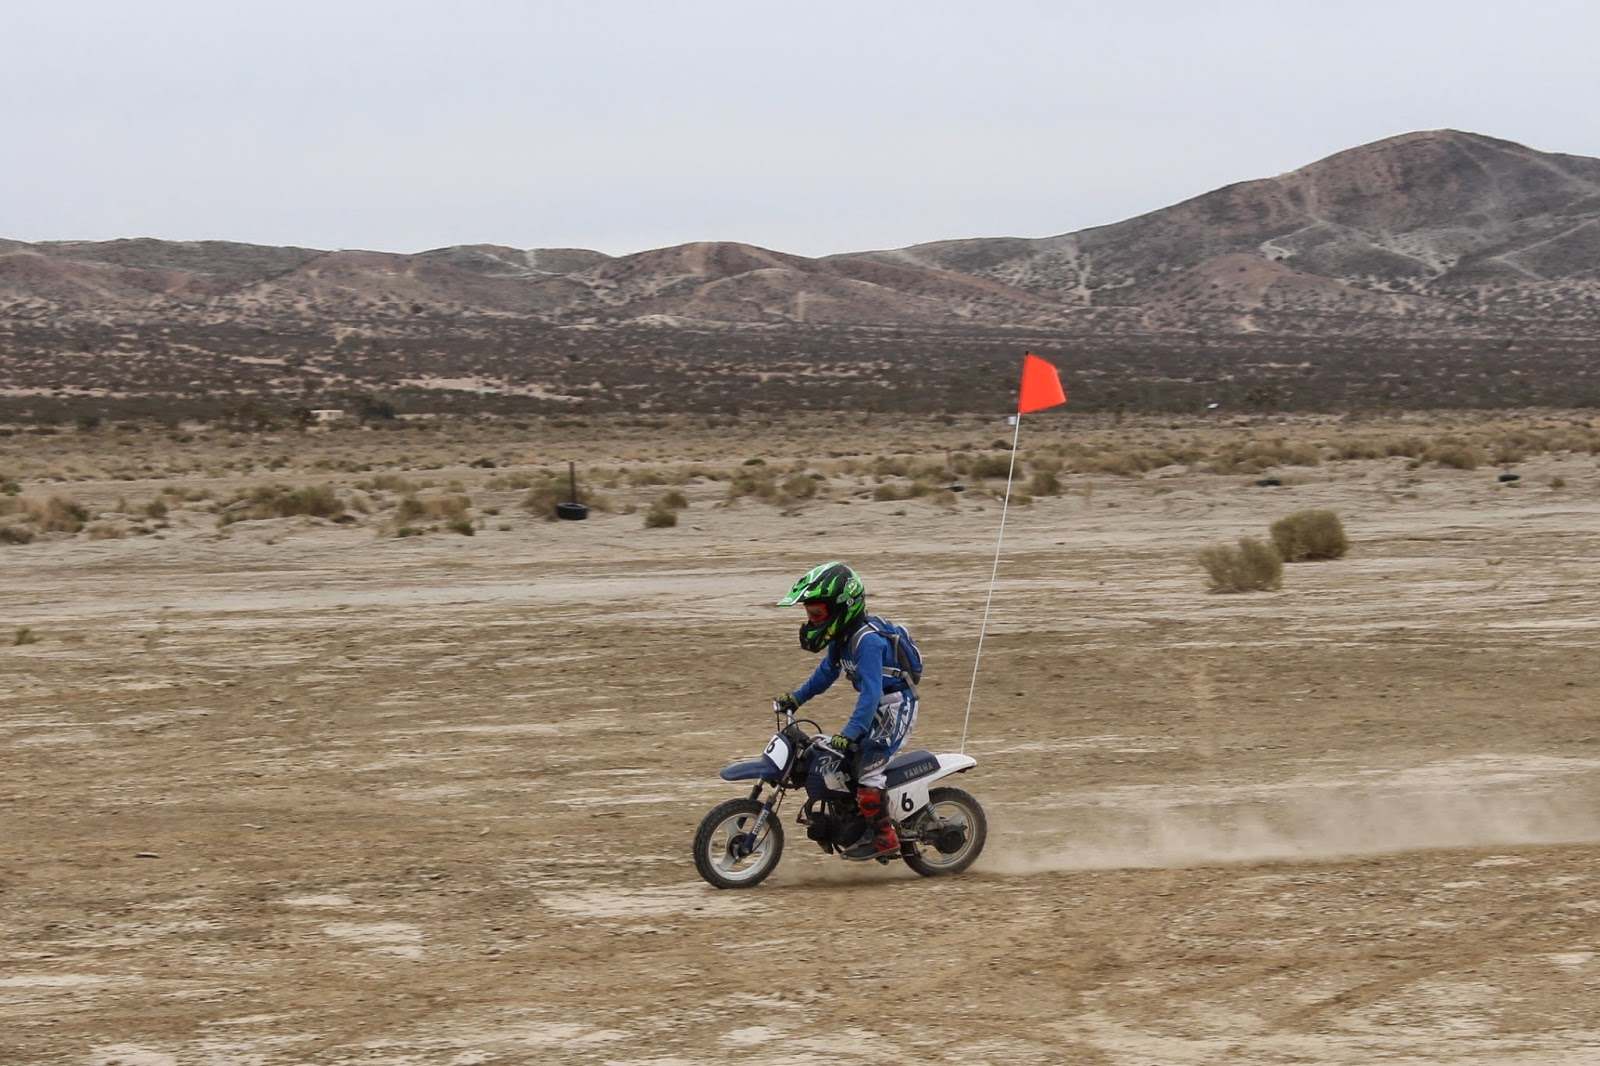 el mirage dry lake bed racing - photo #9